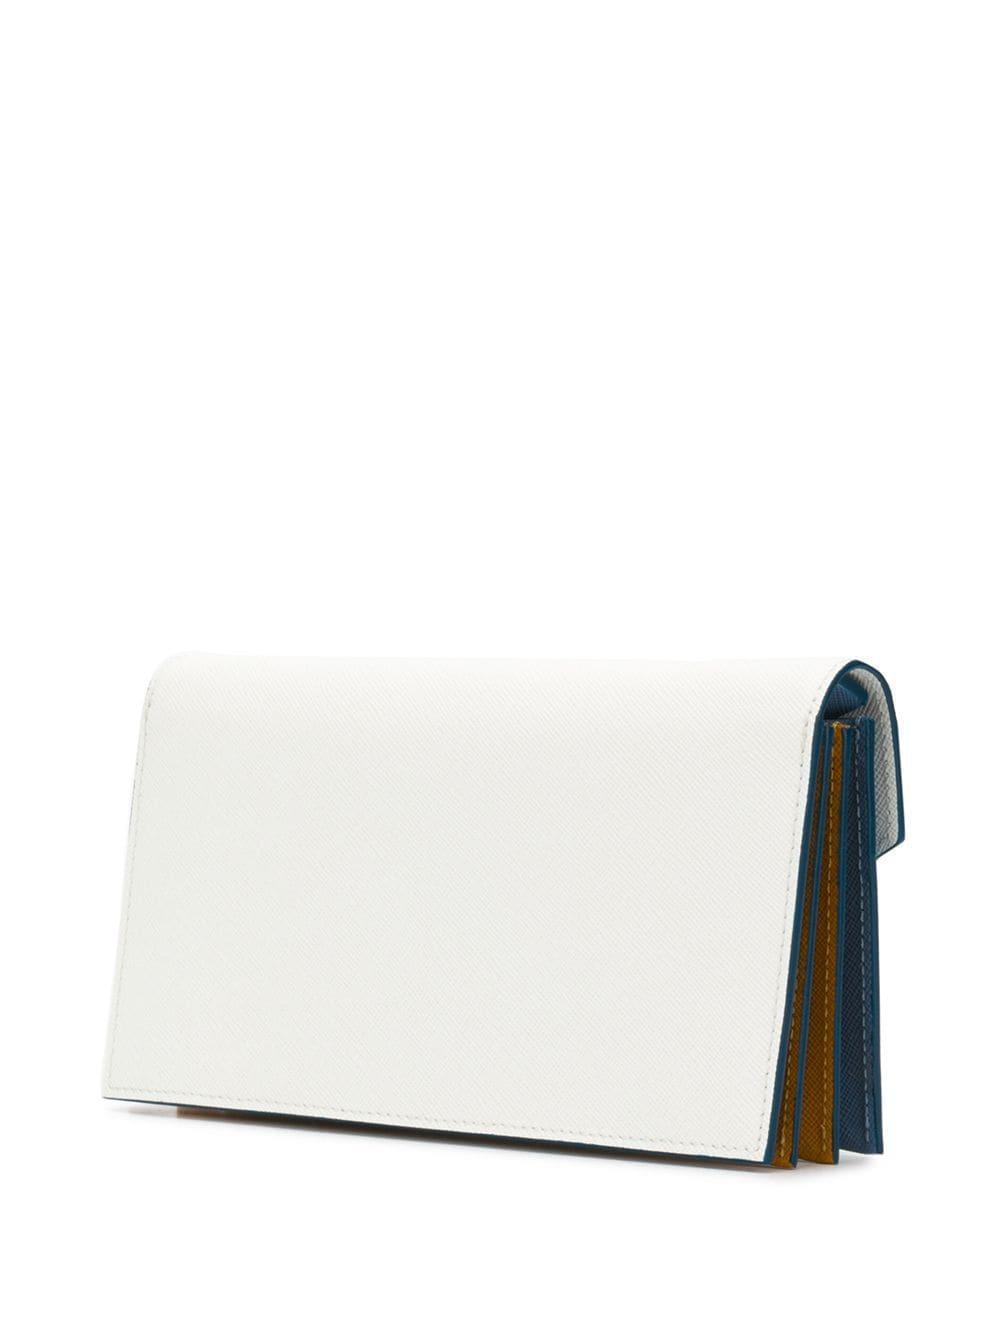 Portefeuille Bellows Cuir Marni en coloris Blanc